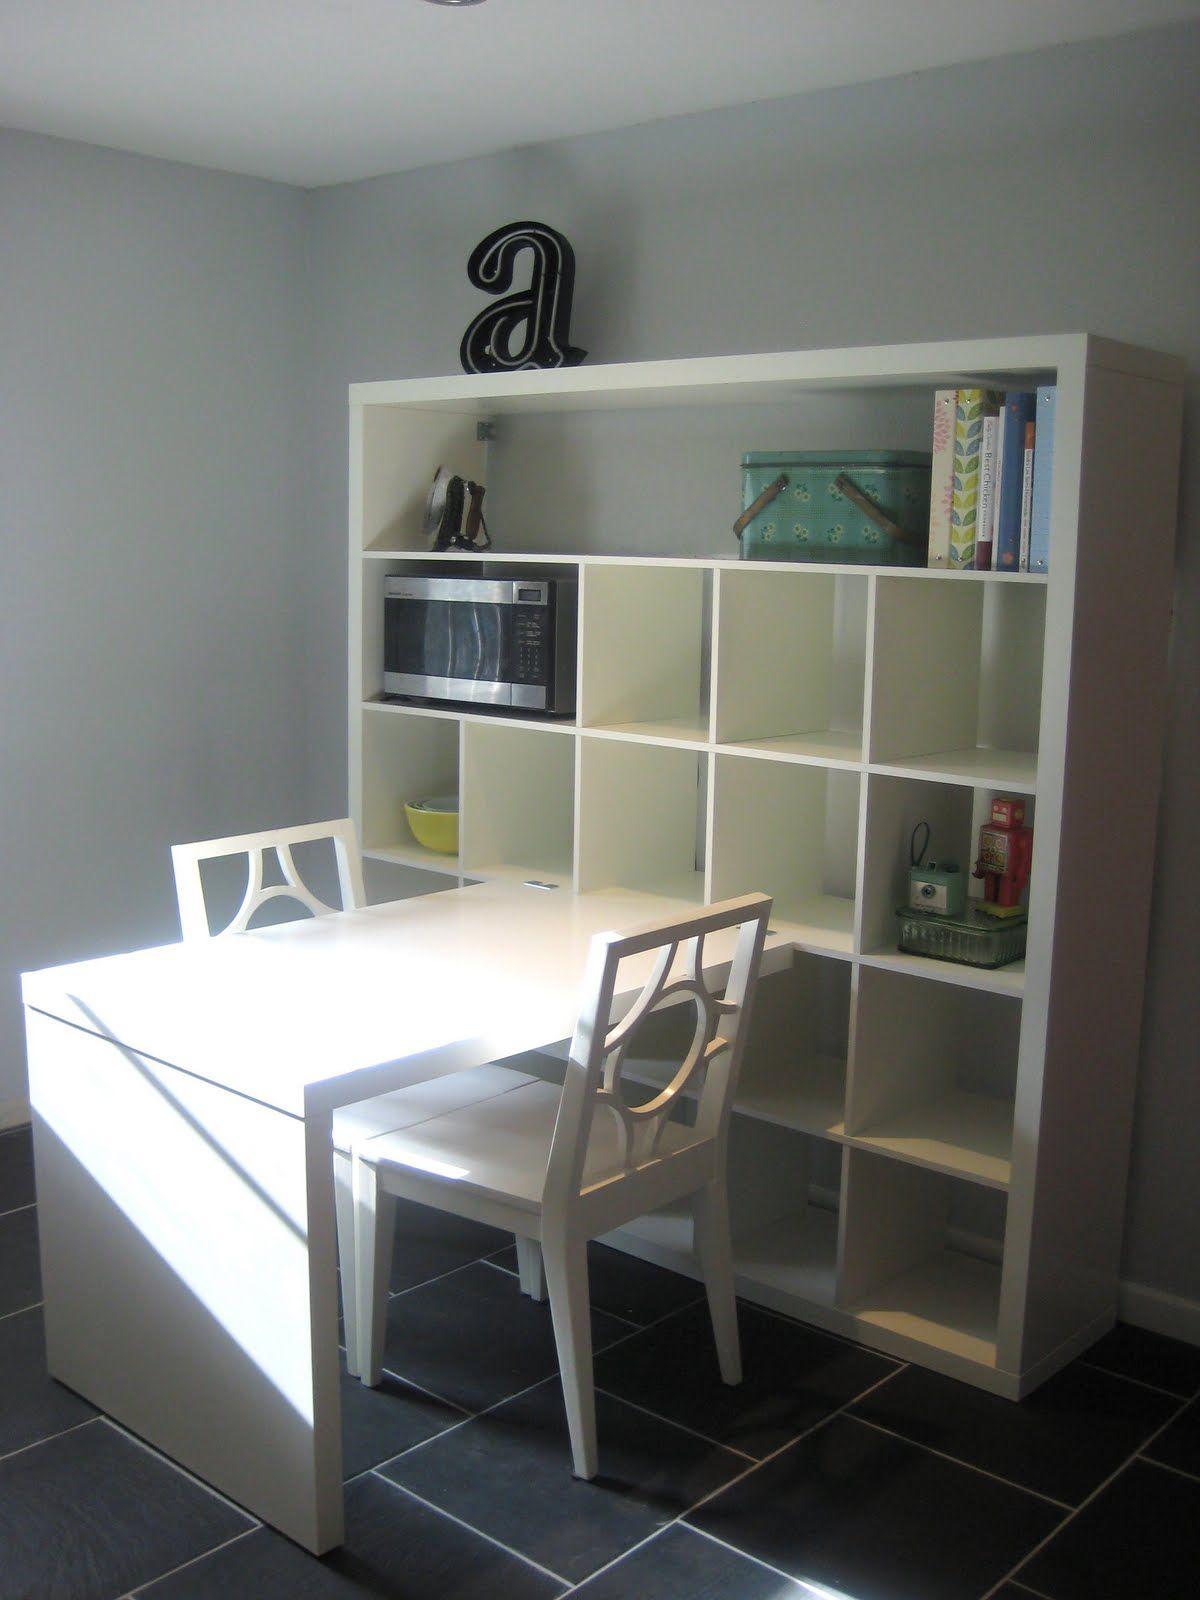 ikea expedit bookshelves and desk scrapbook nook